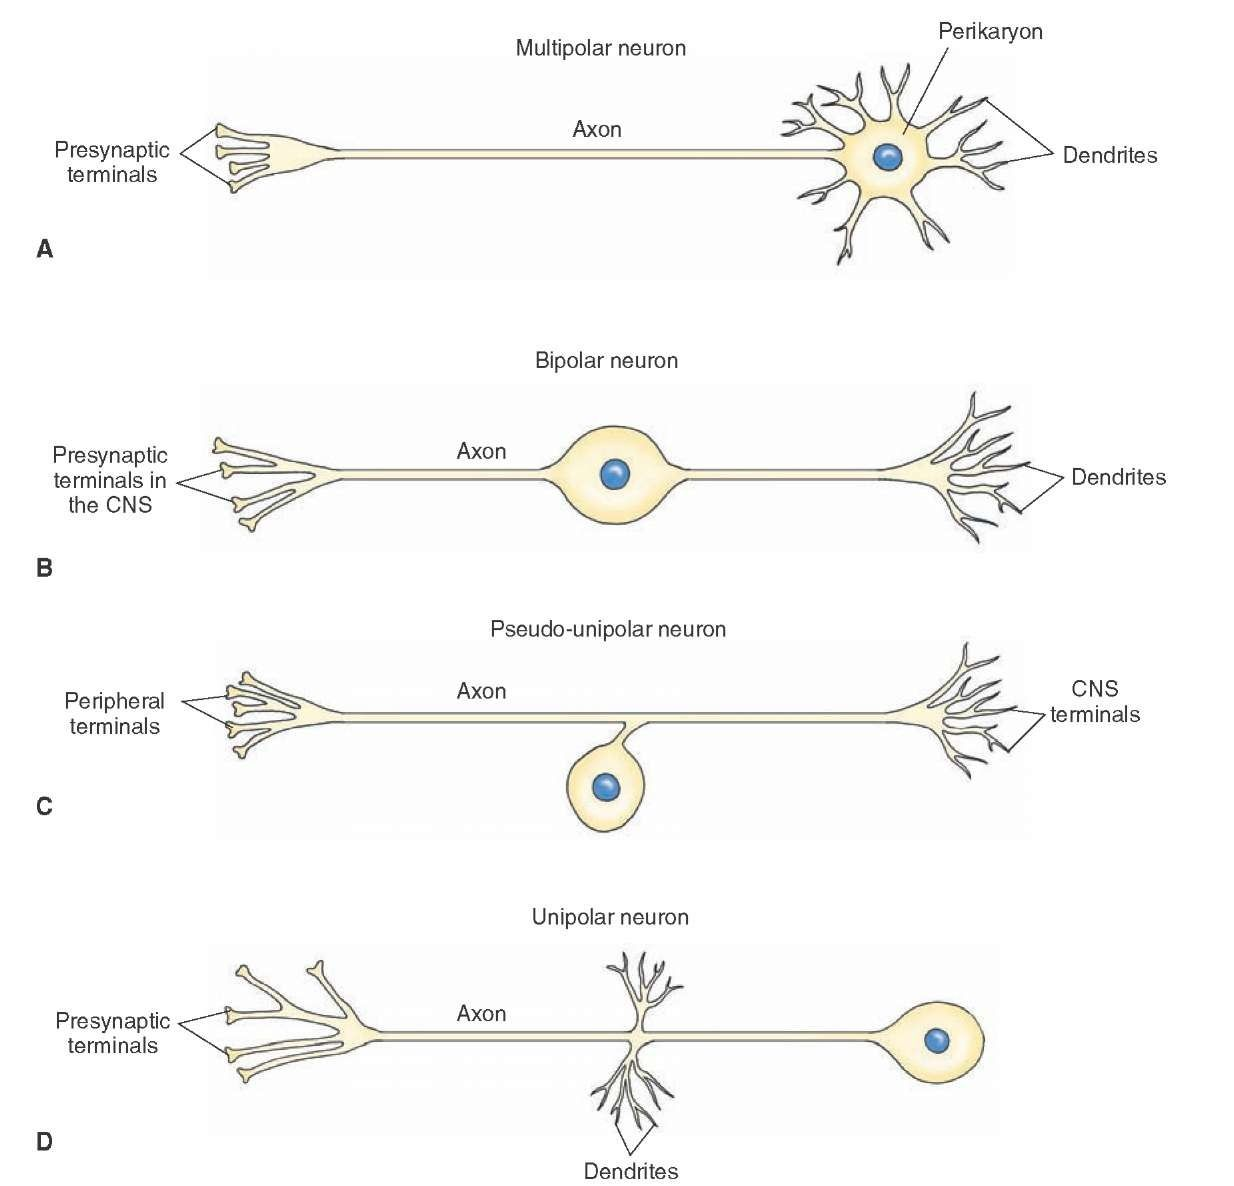 Different types of neurons. (A) Multipolar neuron. (B) Bipolar ...